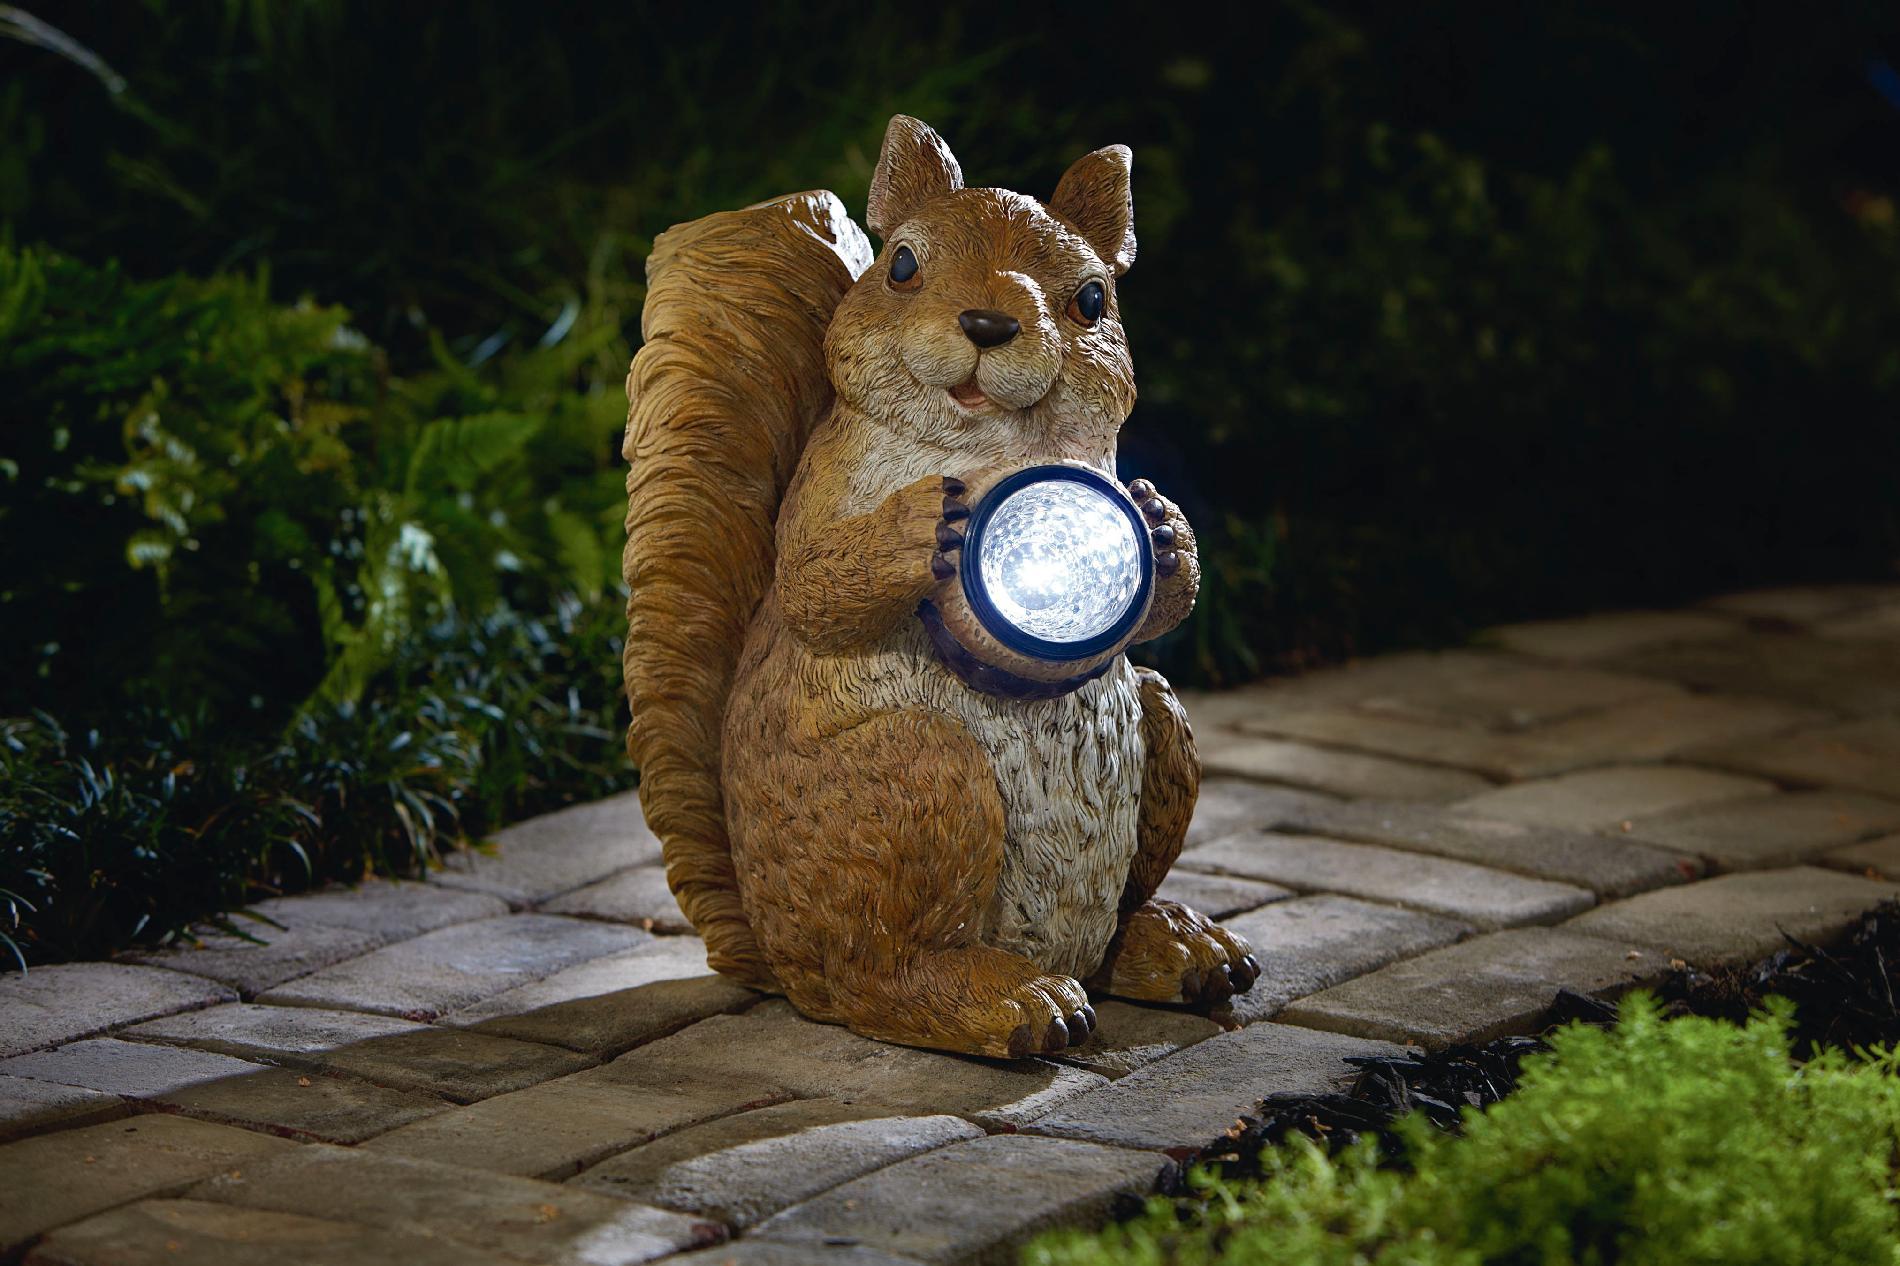 Garden Oasis Squirrel With Solar Acorn